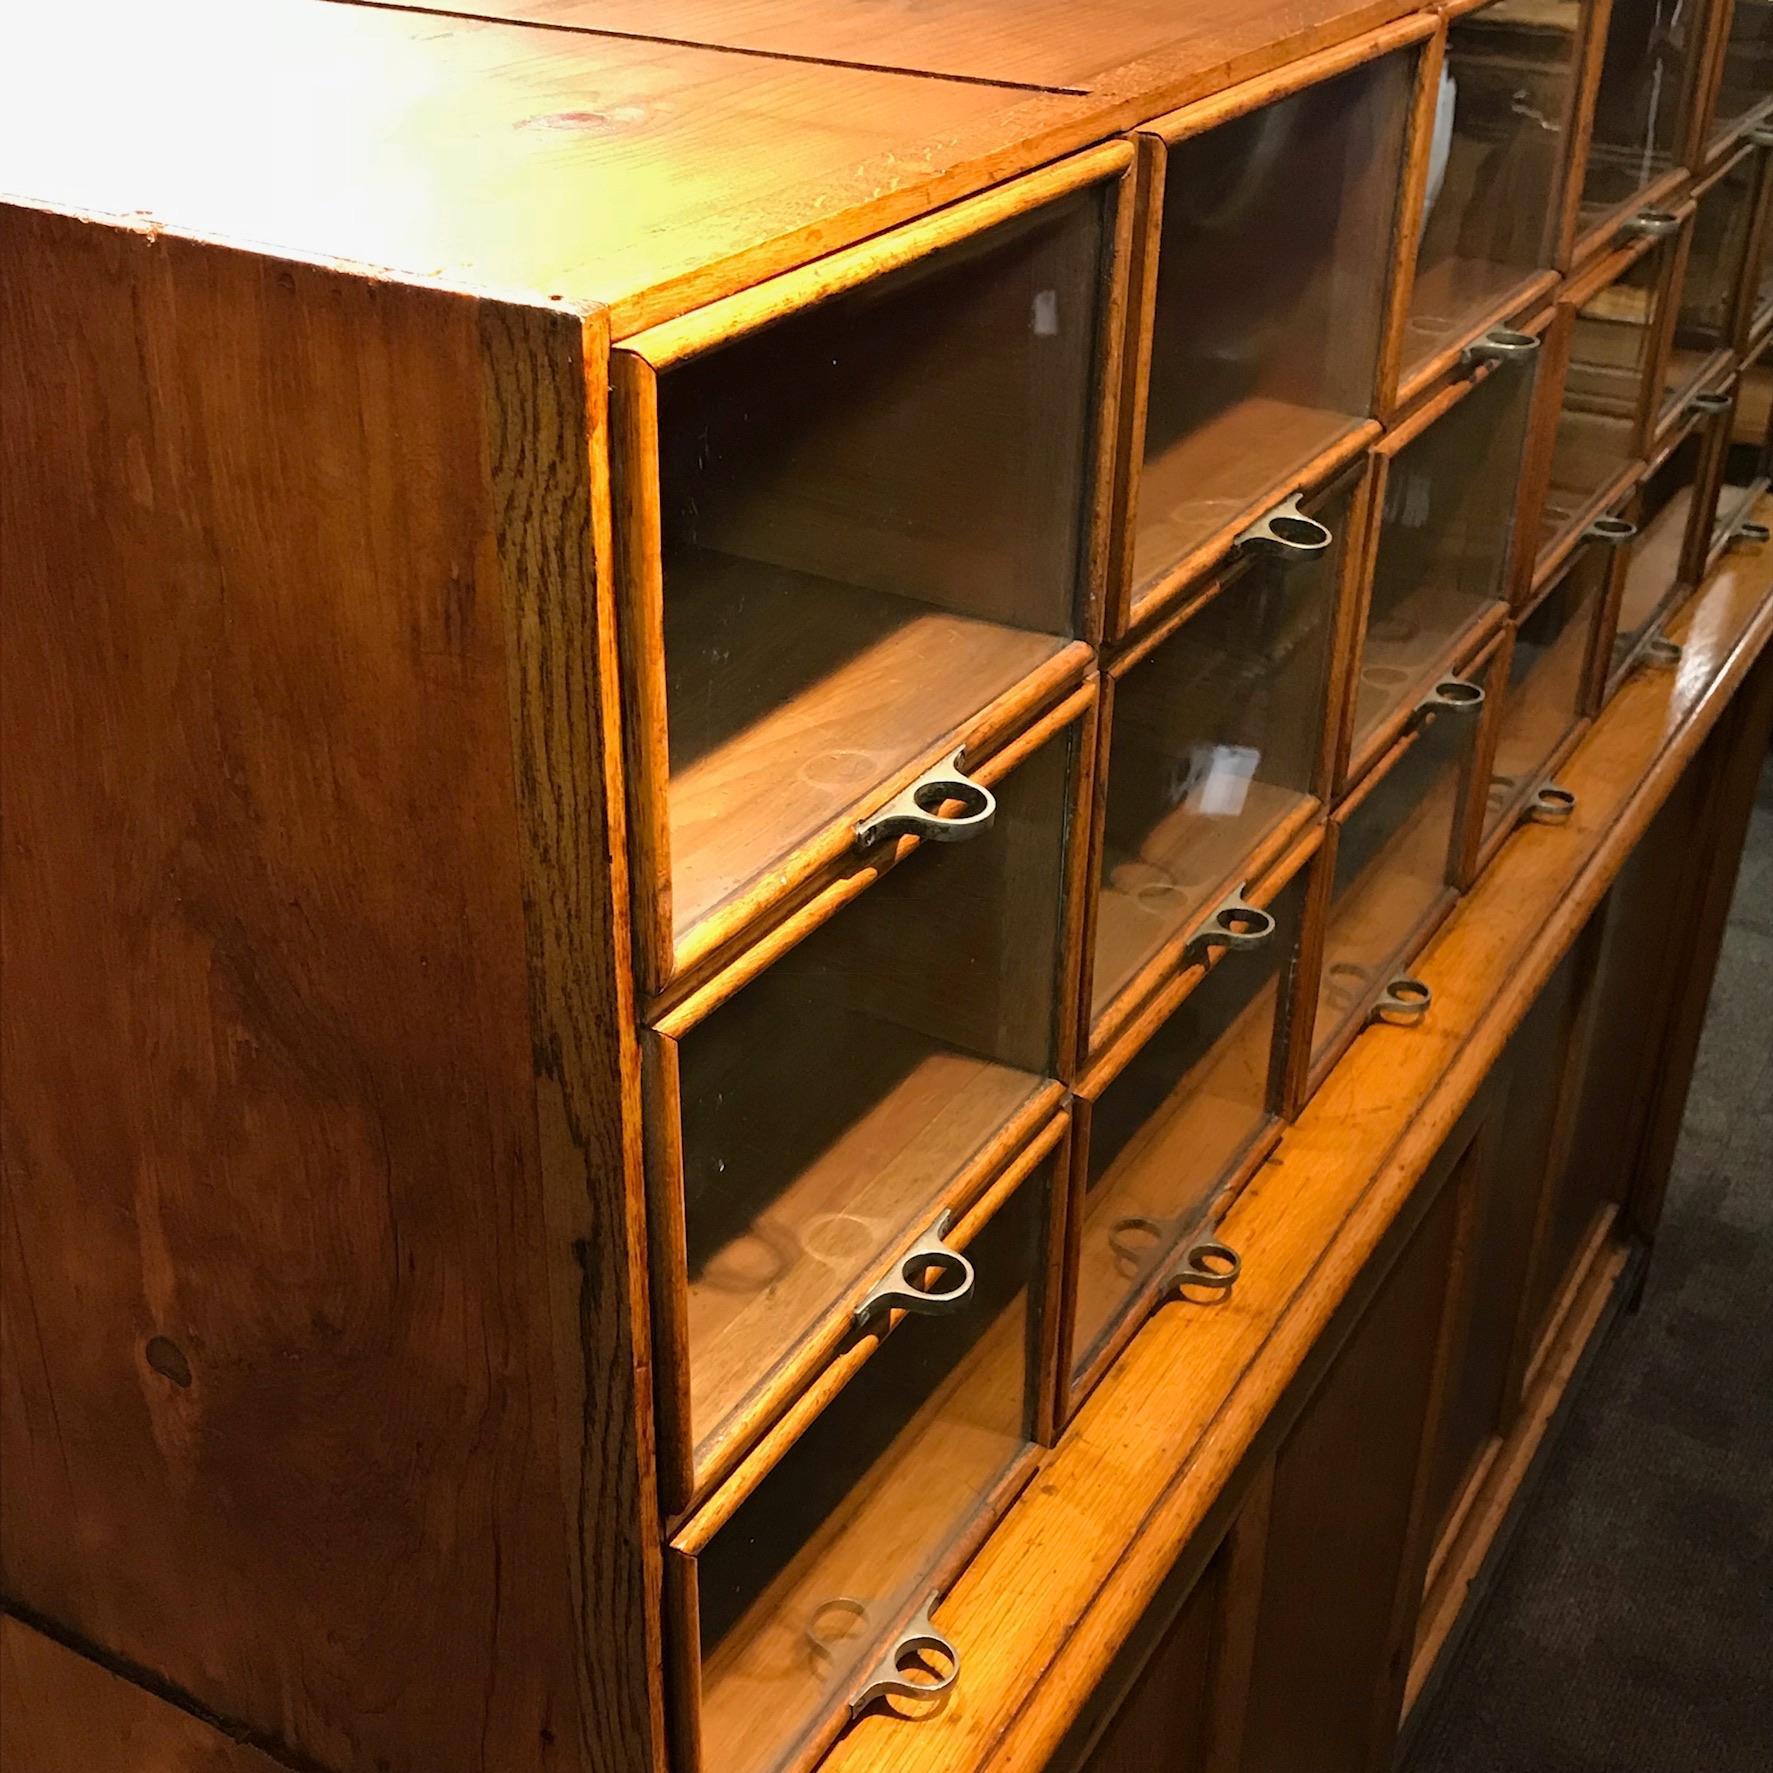 Vintage 1920s Haberdashery Cabinet